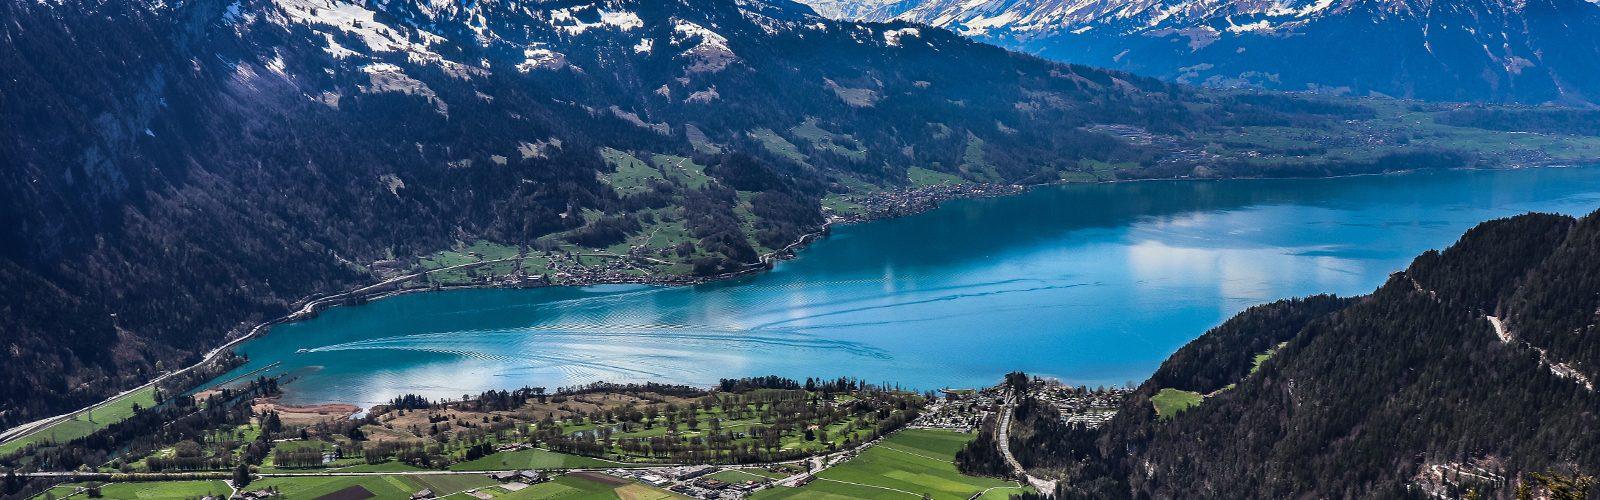 Winters Vs Summer In Switzerland Switzerland Holiday Packages Header